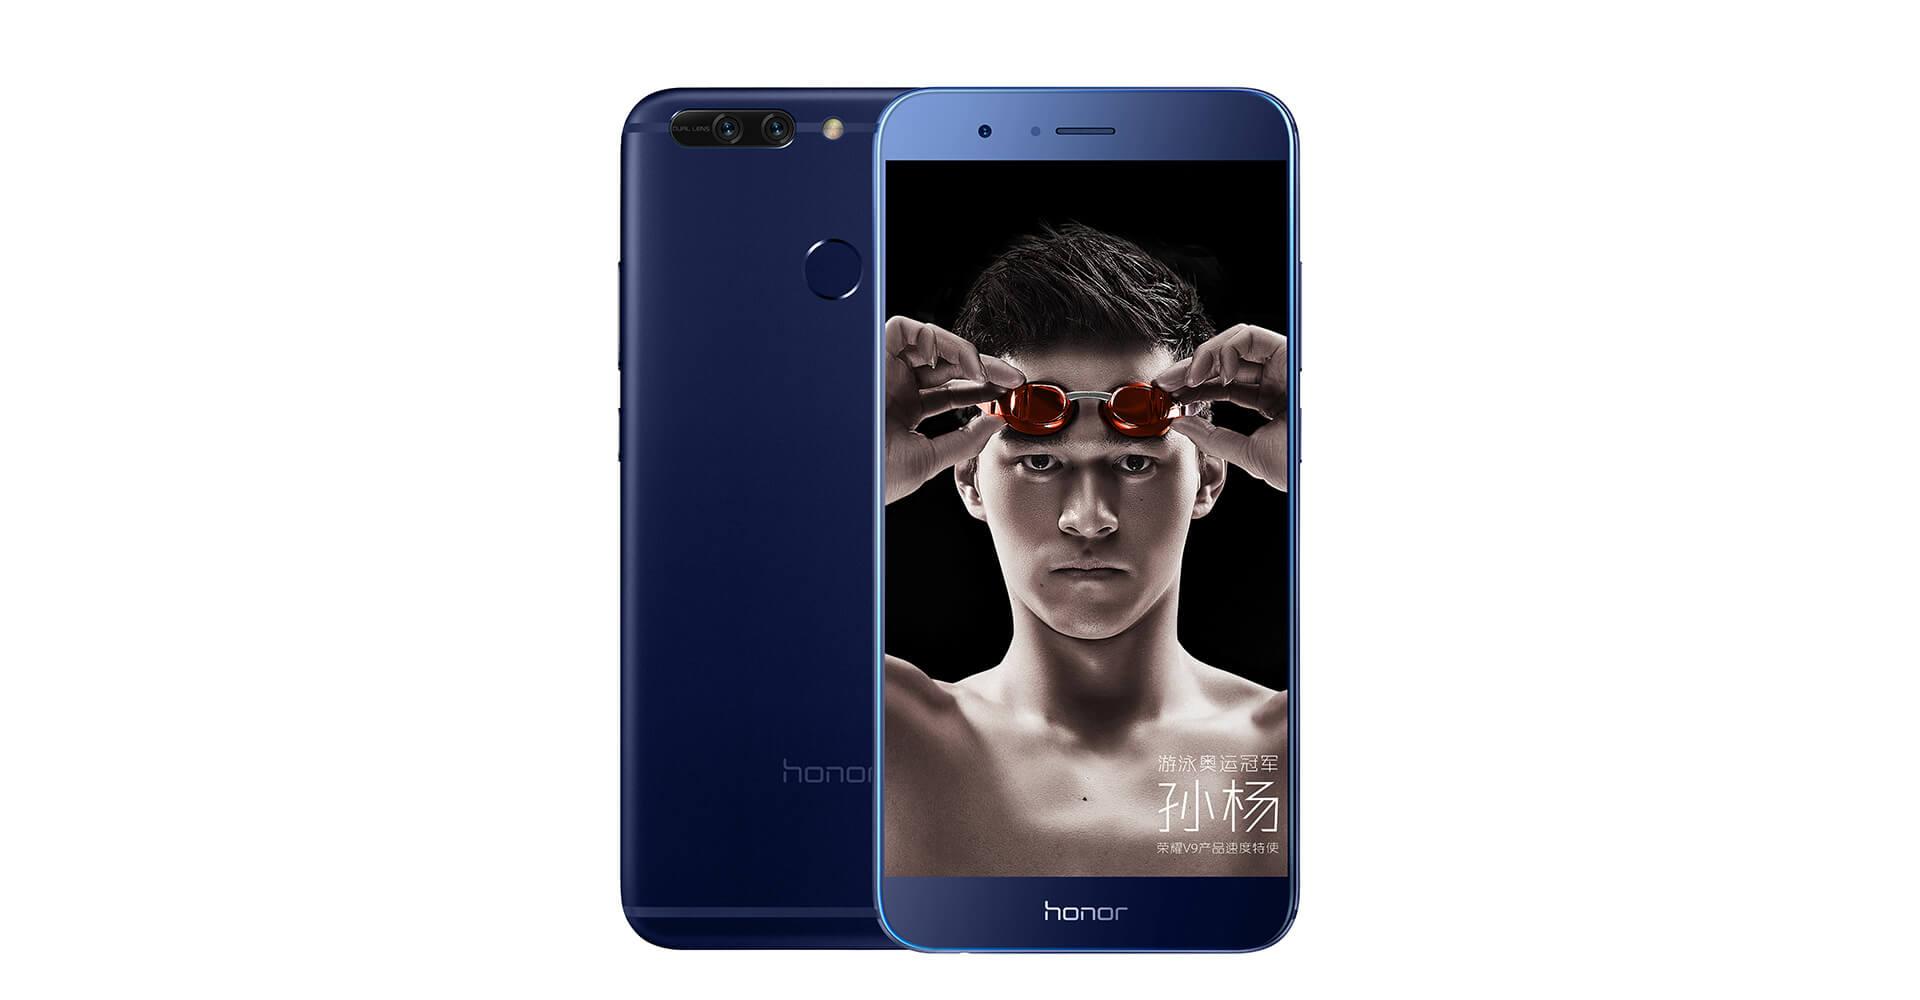 HUAWEI、5.7インチハイエンドスマホ「honor V9」を中国で発表